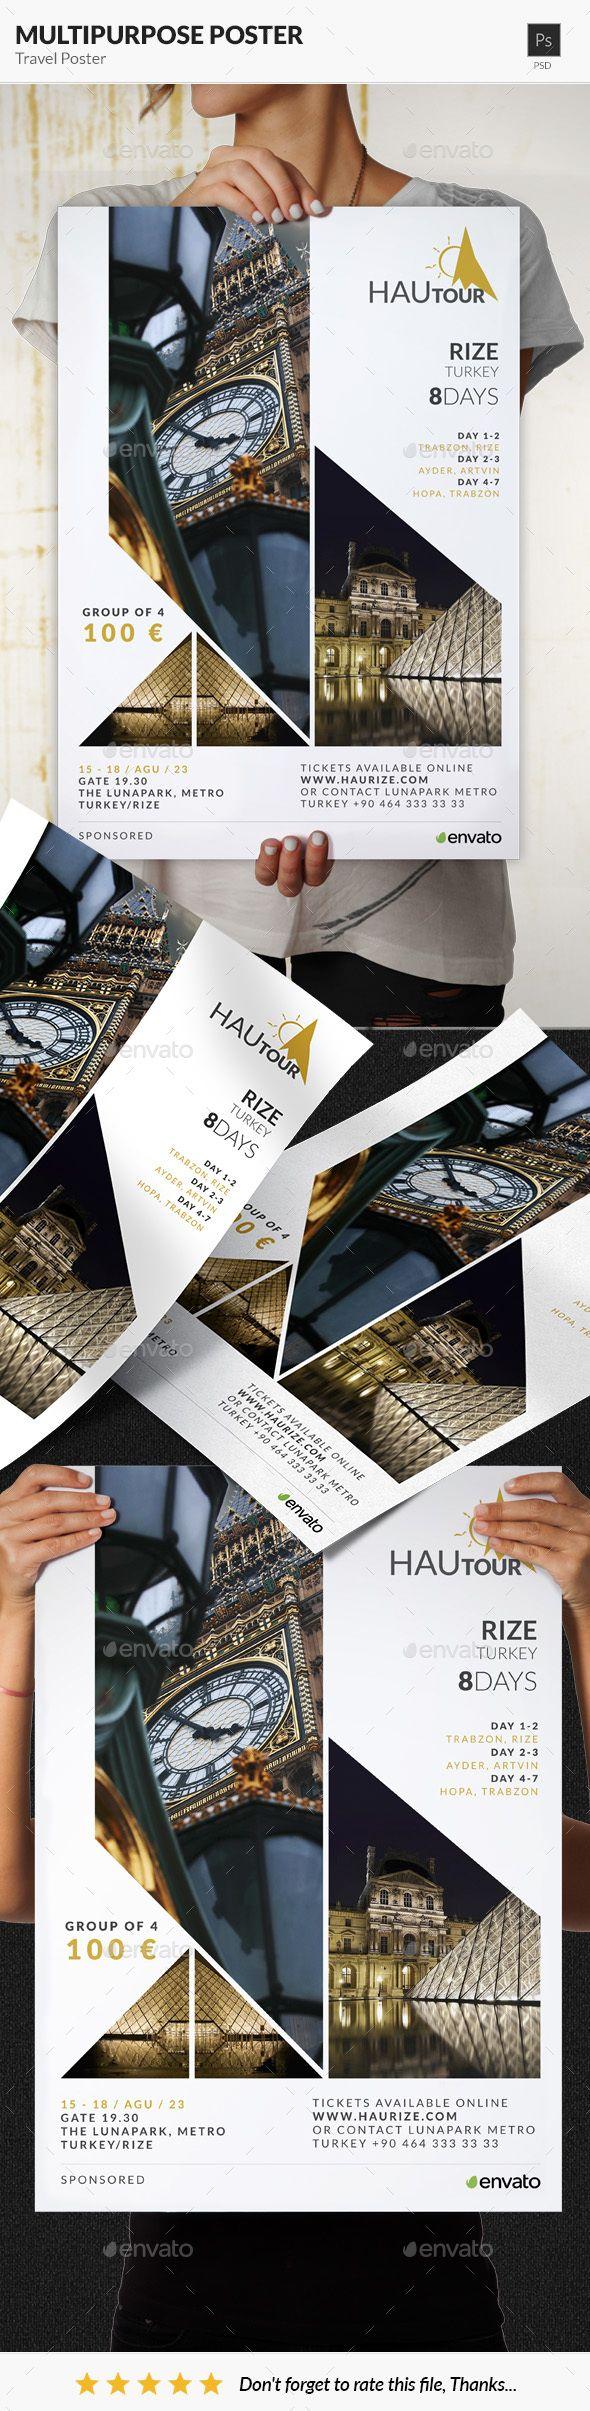 Poster design download - Poster Design Download 44